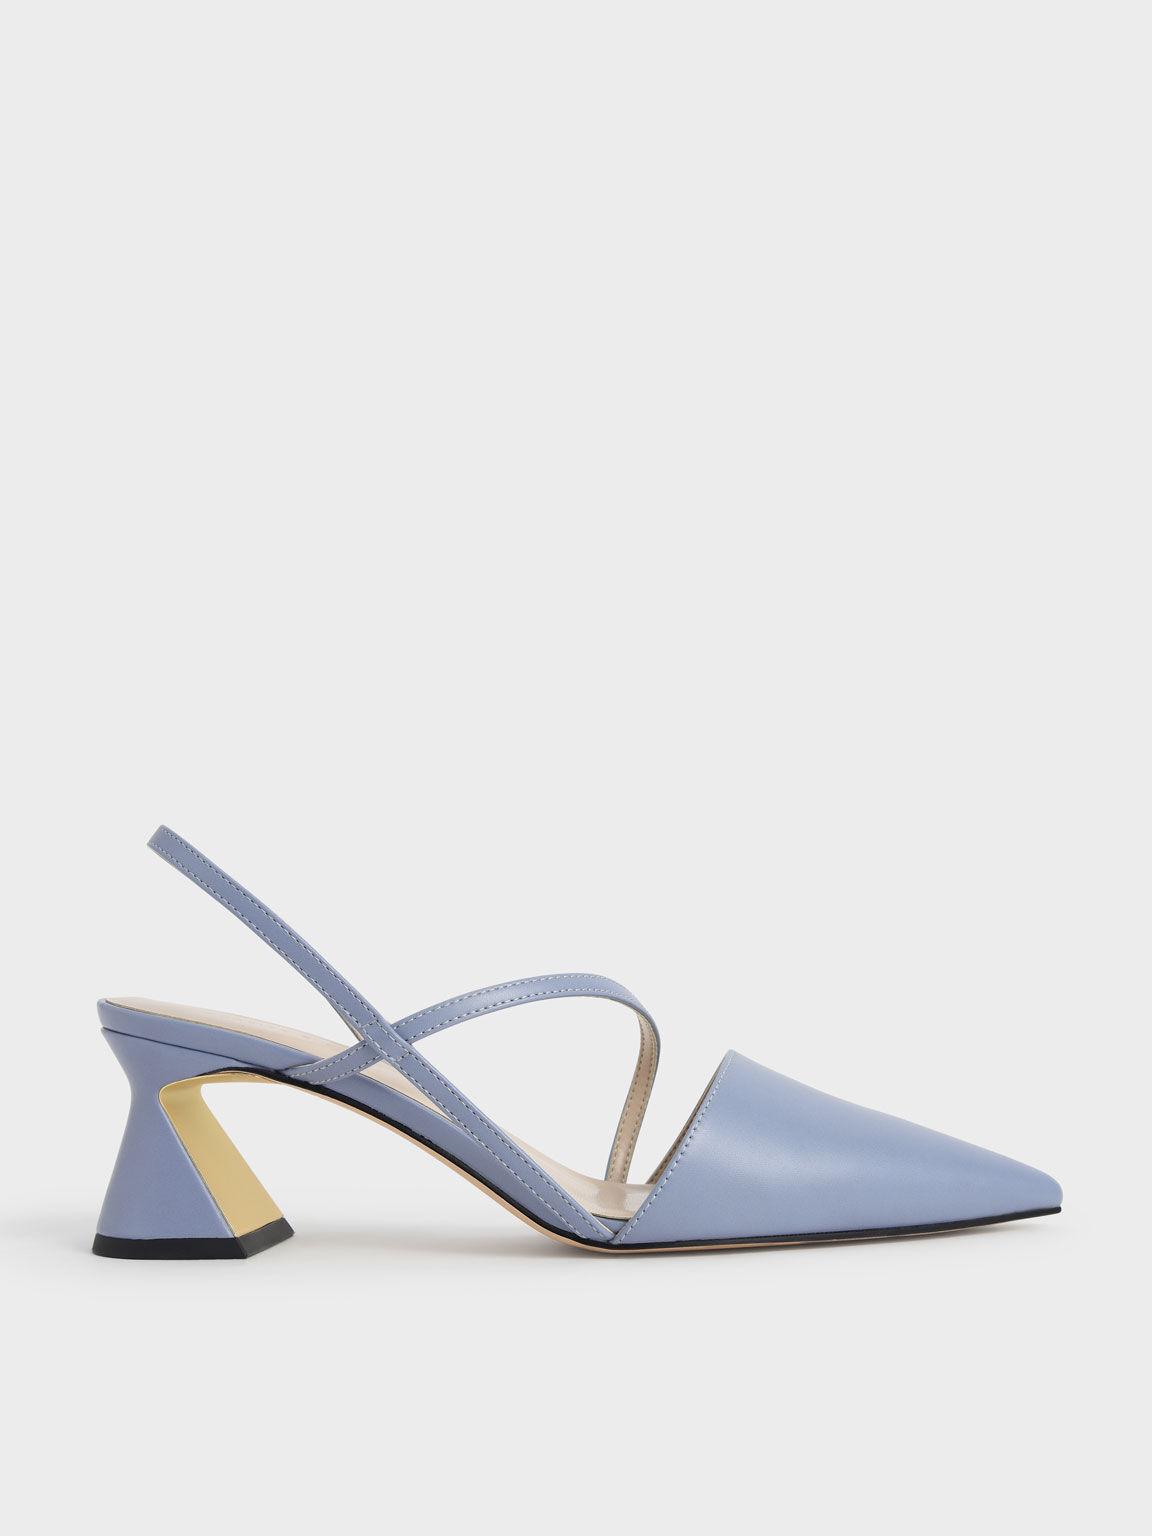 Asymmetric Strap Geometric Heel Pumps, Light Blue, hi-res